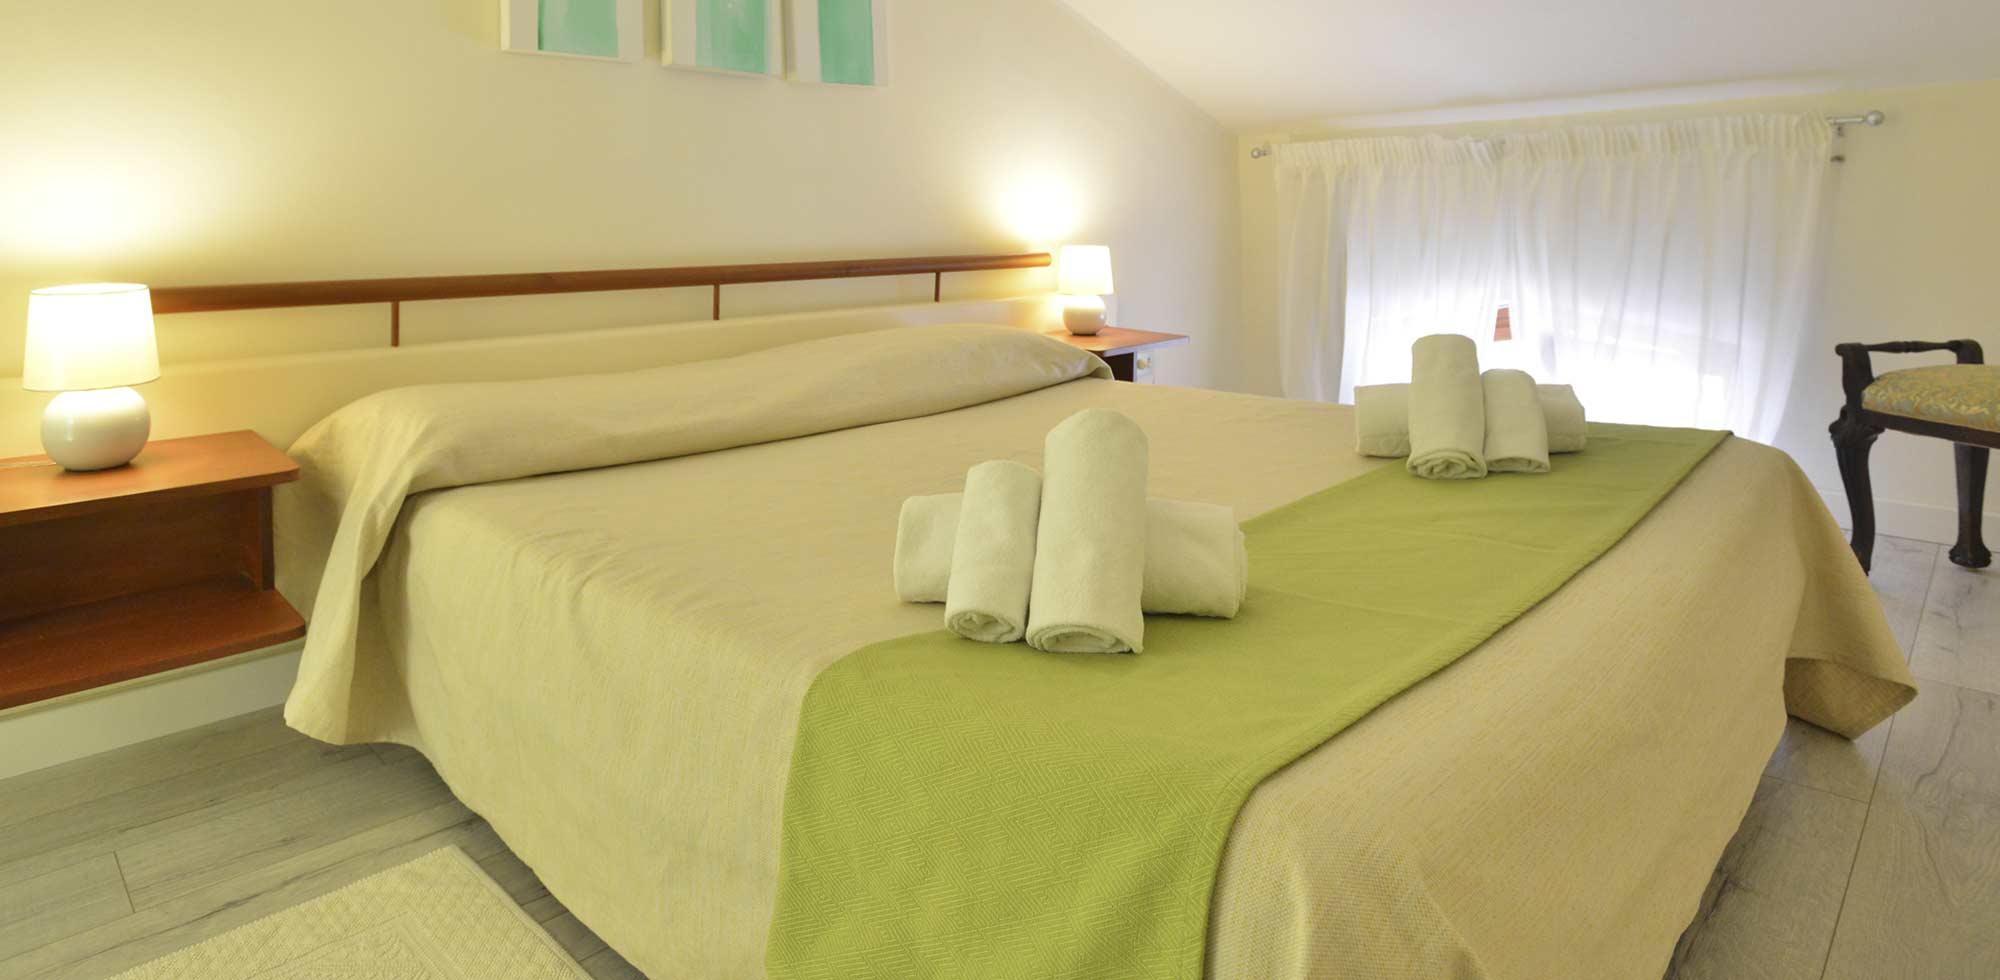 Maison Matisse Appartamento